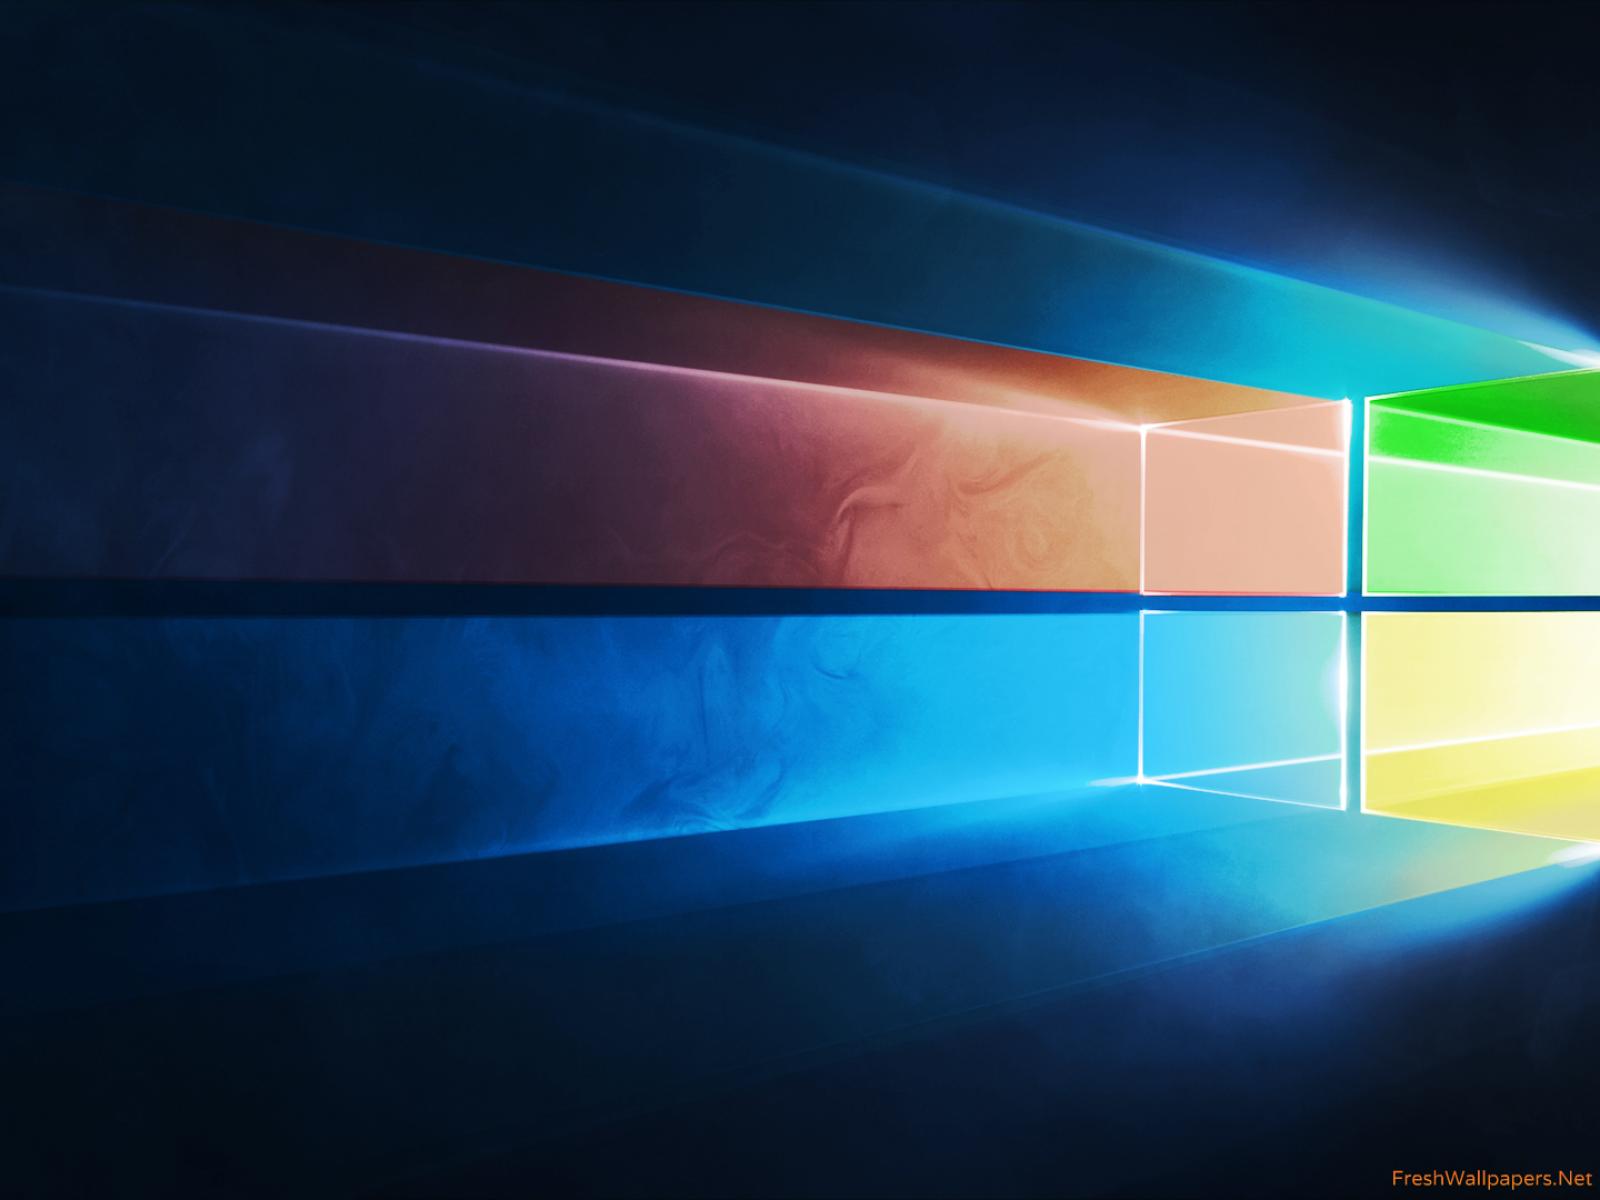 windows 10 1080p wallpapers wallpaper hd desktop 1600x1200 px 2 13 mb